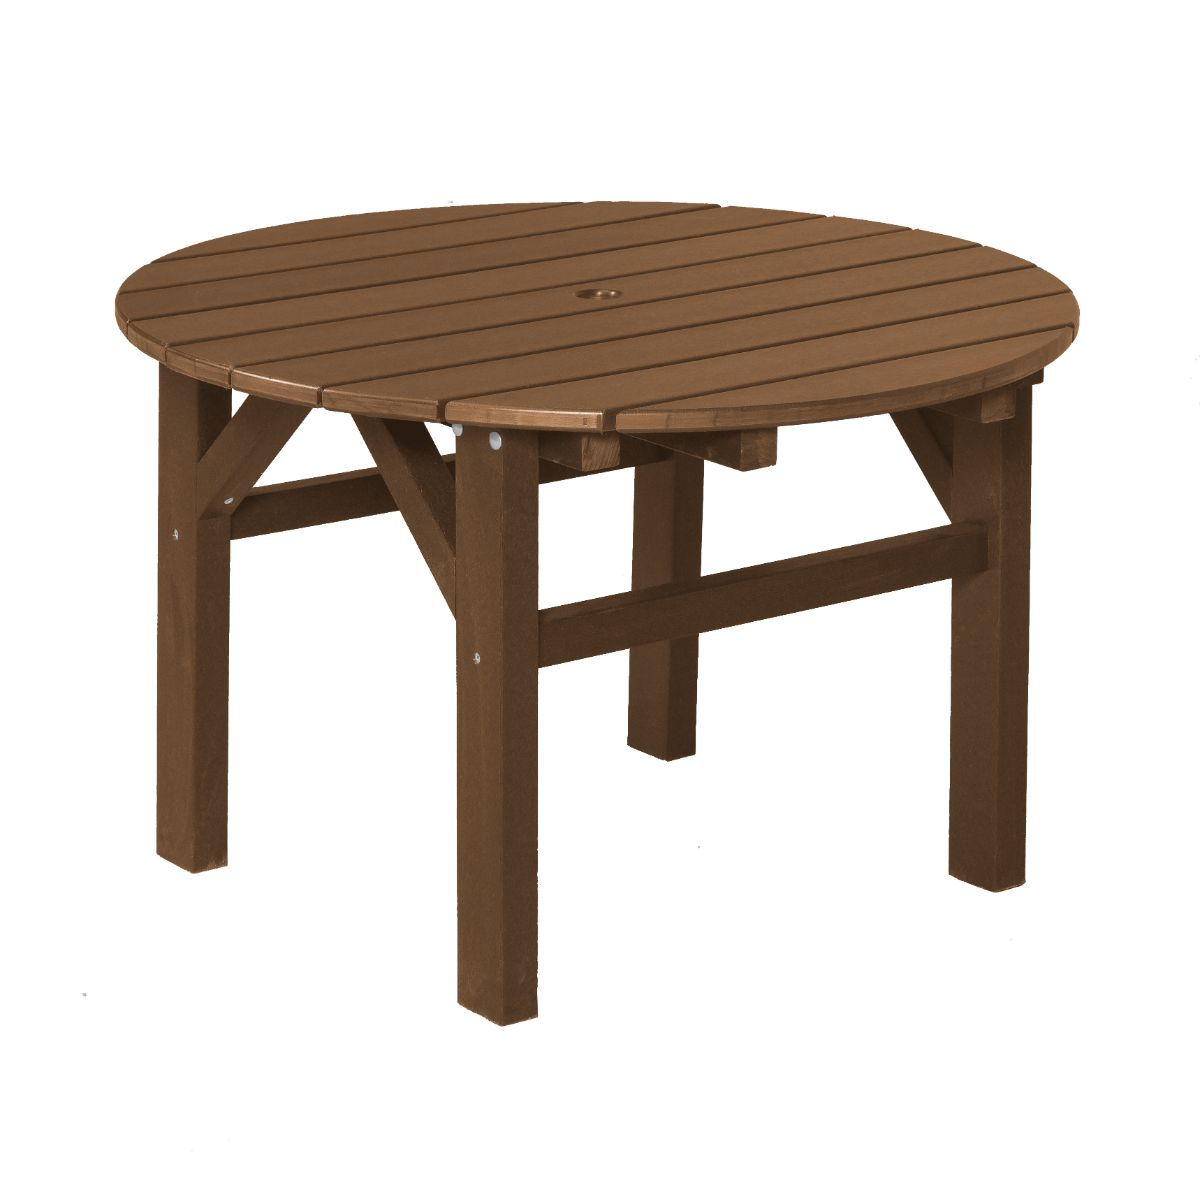 Tudor Brown Odessa Outdoor Coffee Table